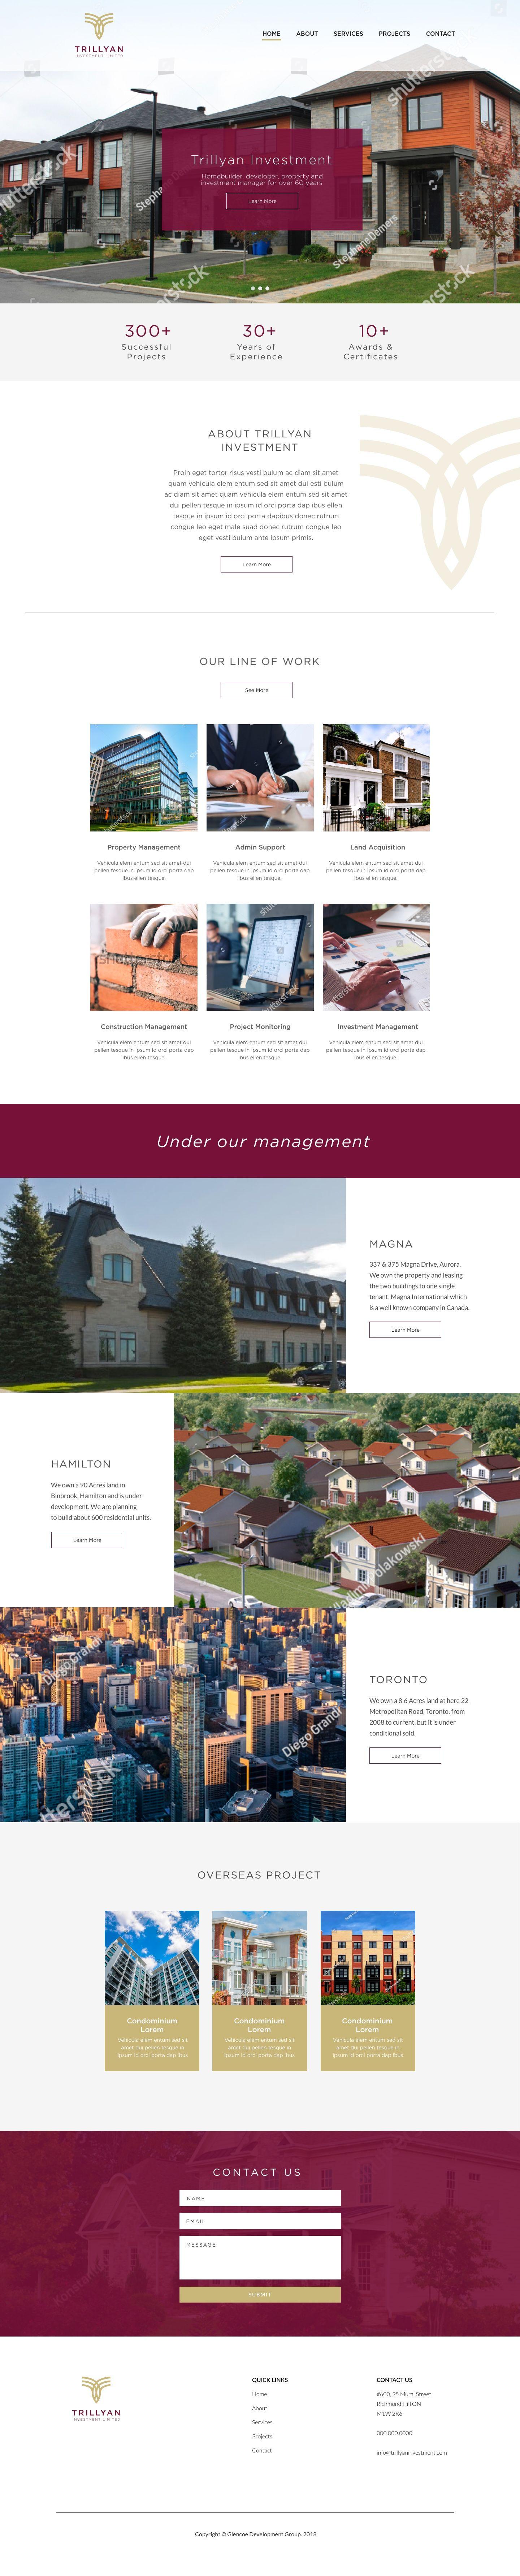 Trillyan Investment Real Estate Design Web Design